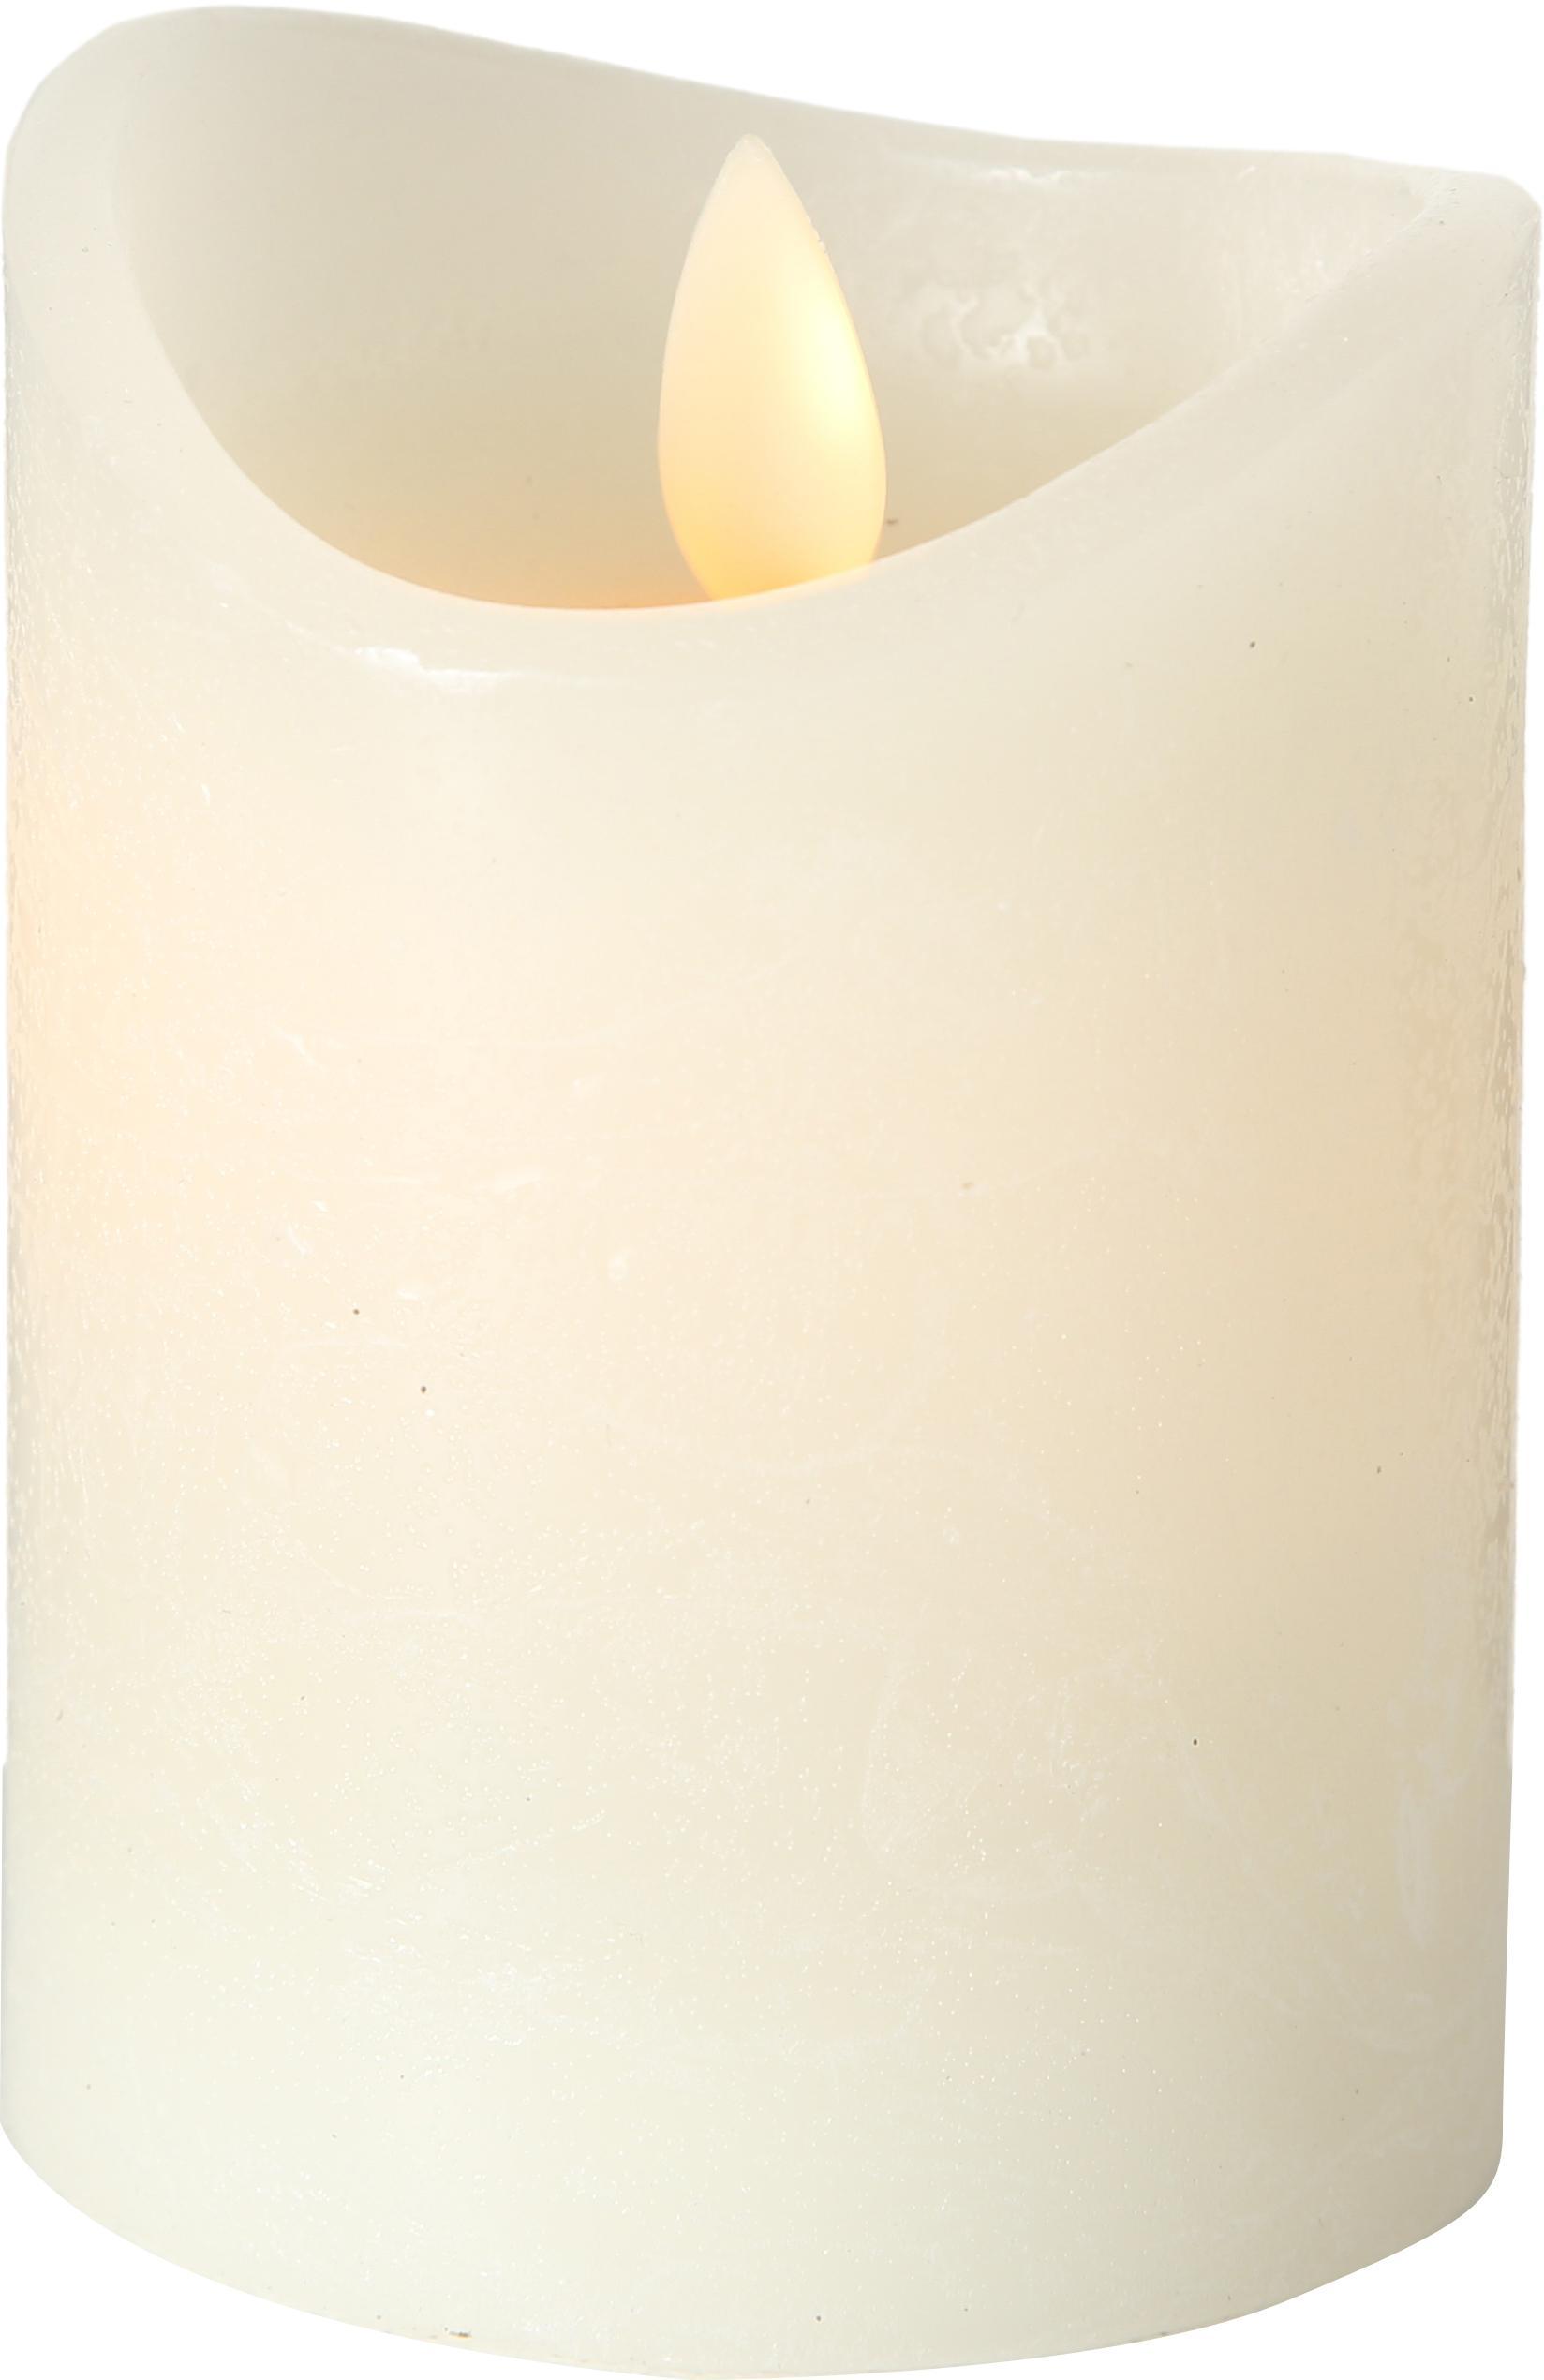 Vela LED Bino, Crema, Ø 8 x Al 10 cm